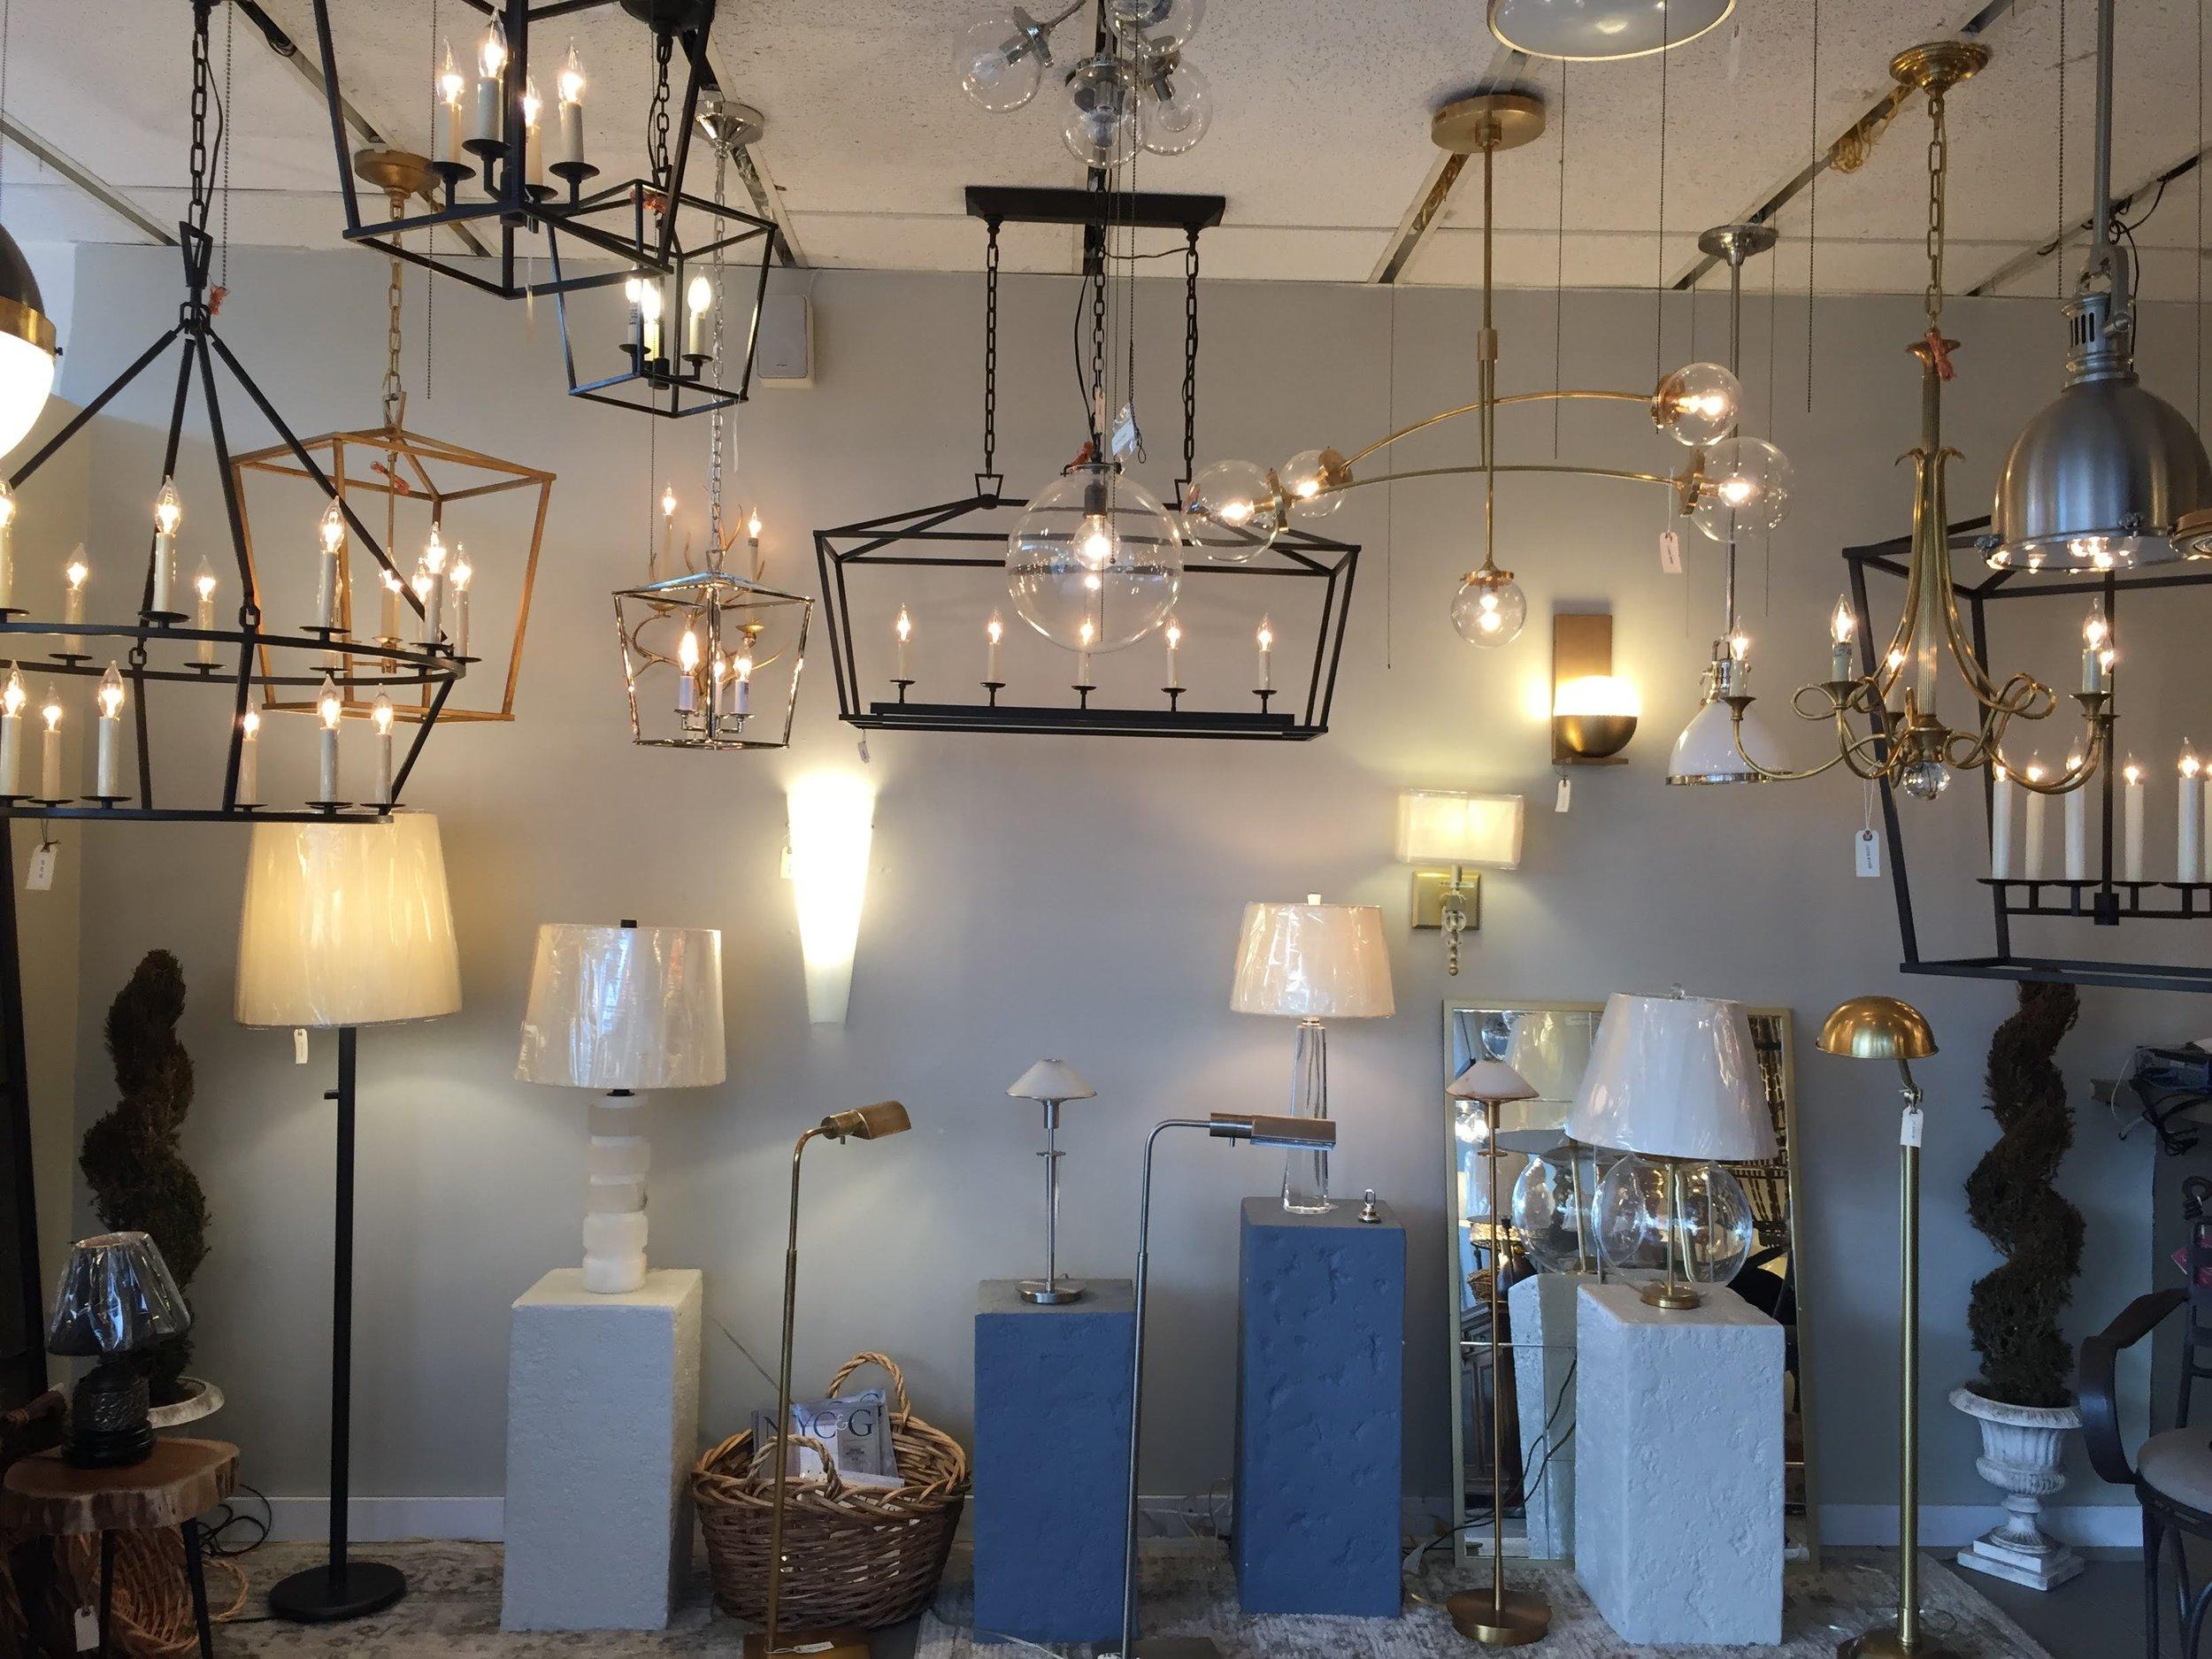 Bedford Lighting Lamps Shades Repairs More